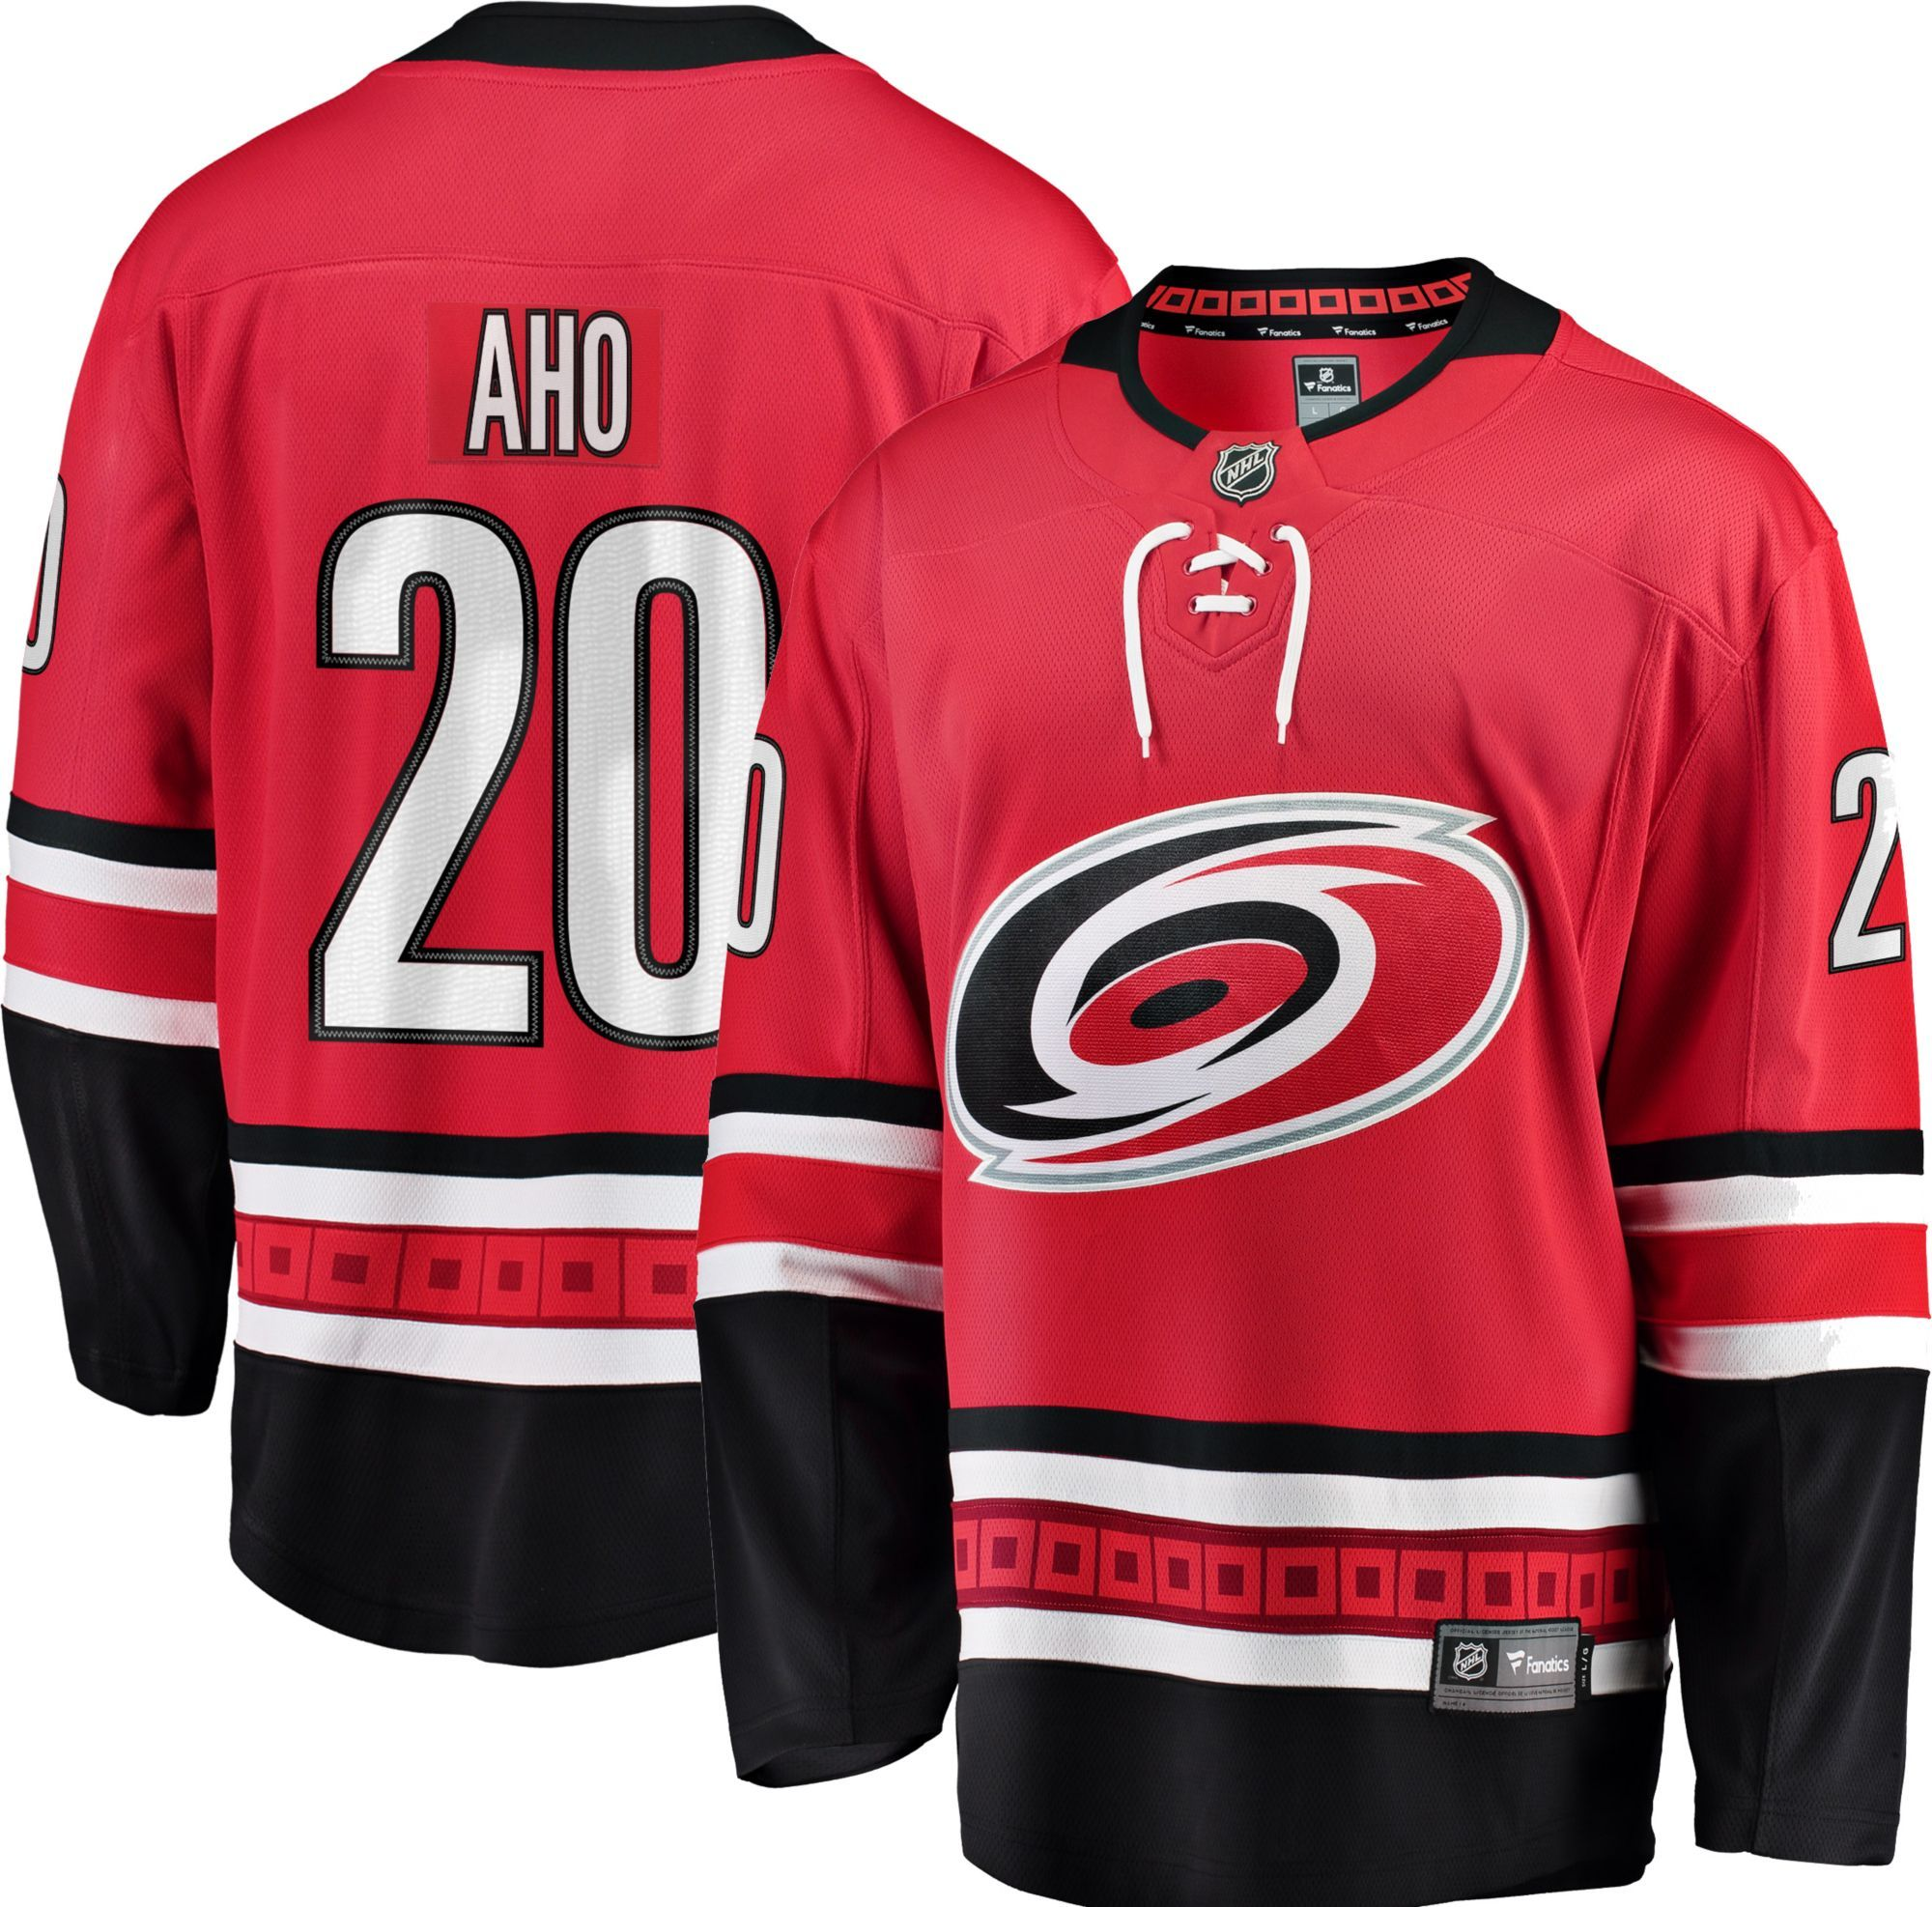 913dcf24fa7ee NHL Men's Carolina Hurricanes Sebastian Aho #20 Breakaway Home ...